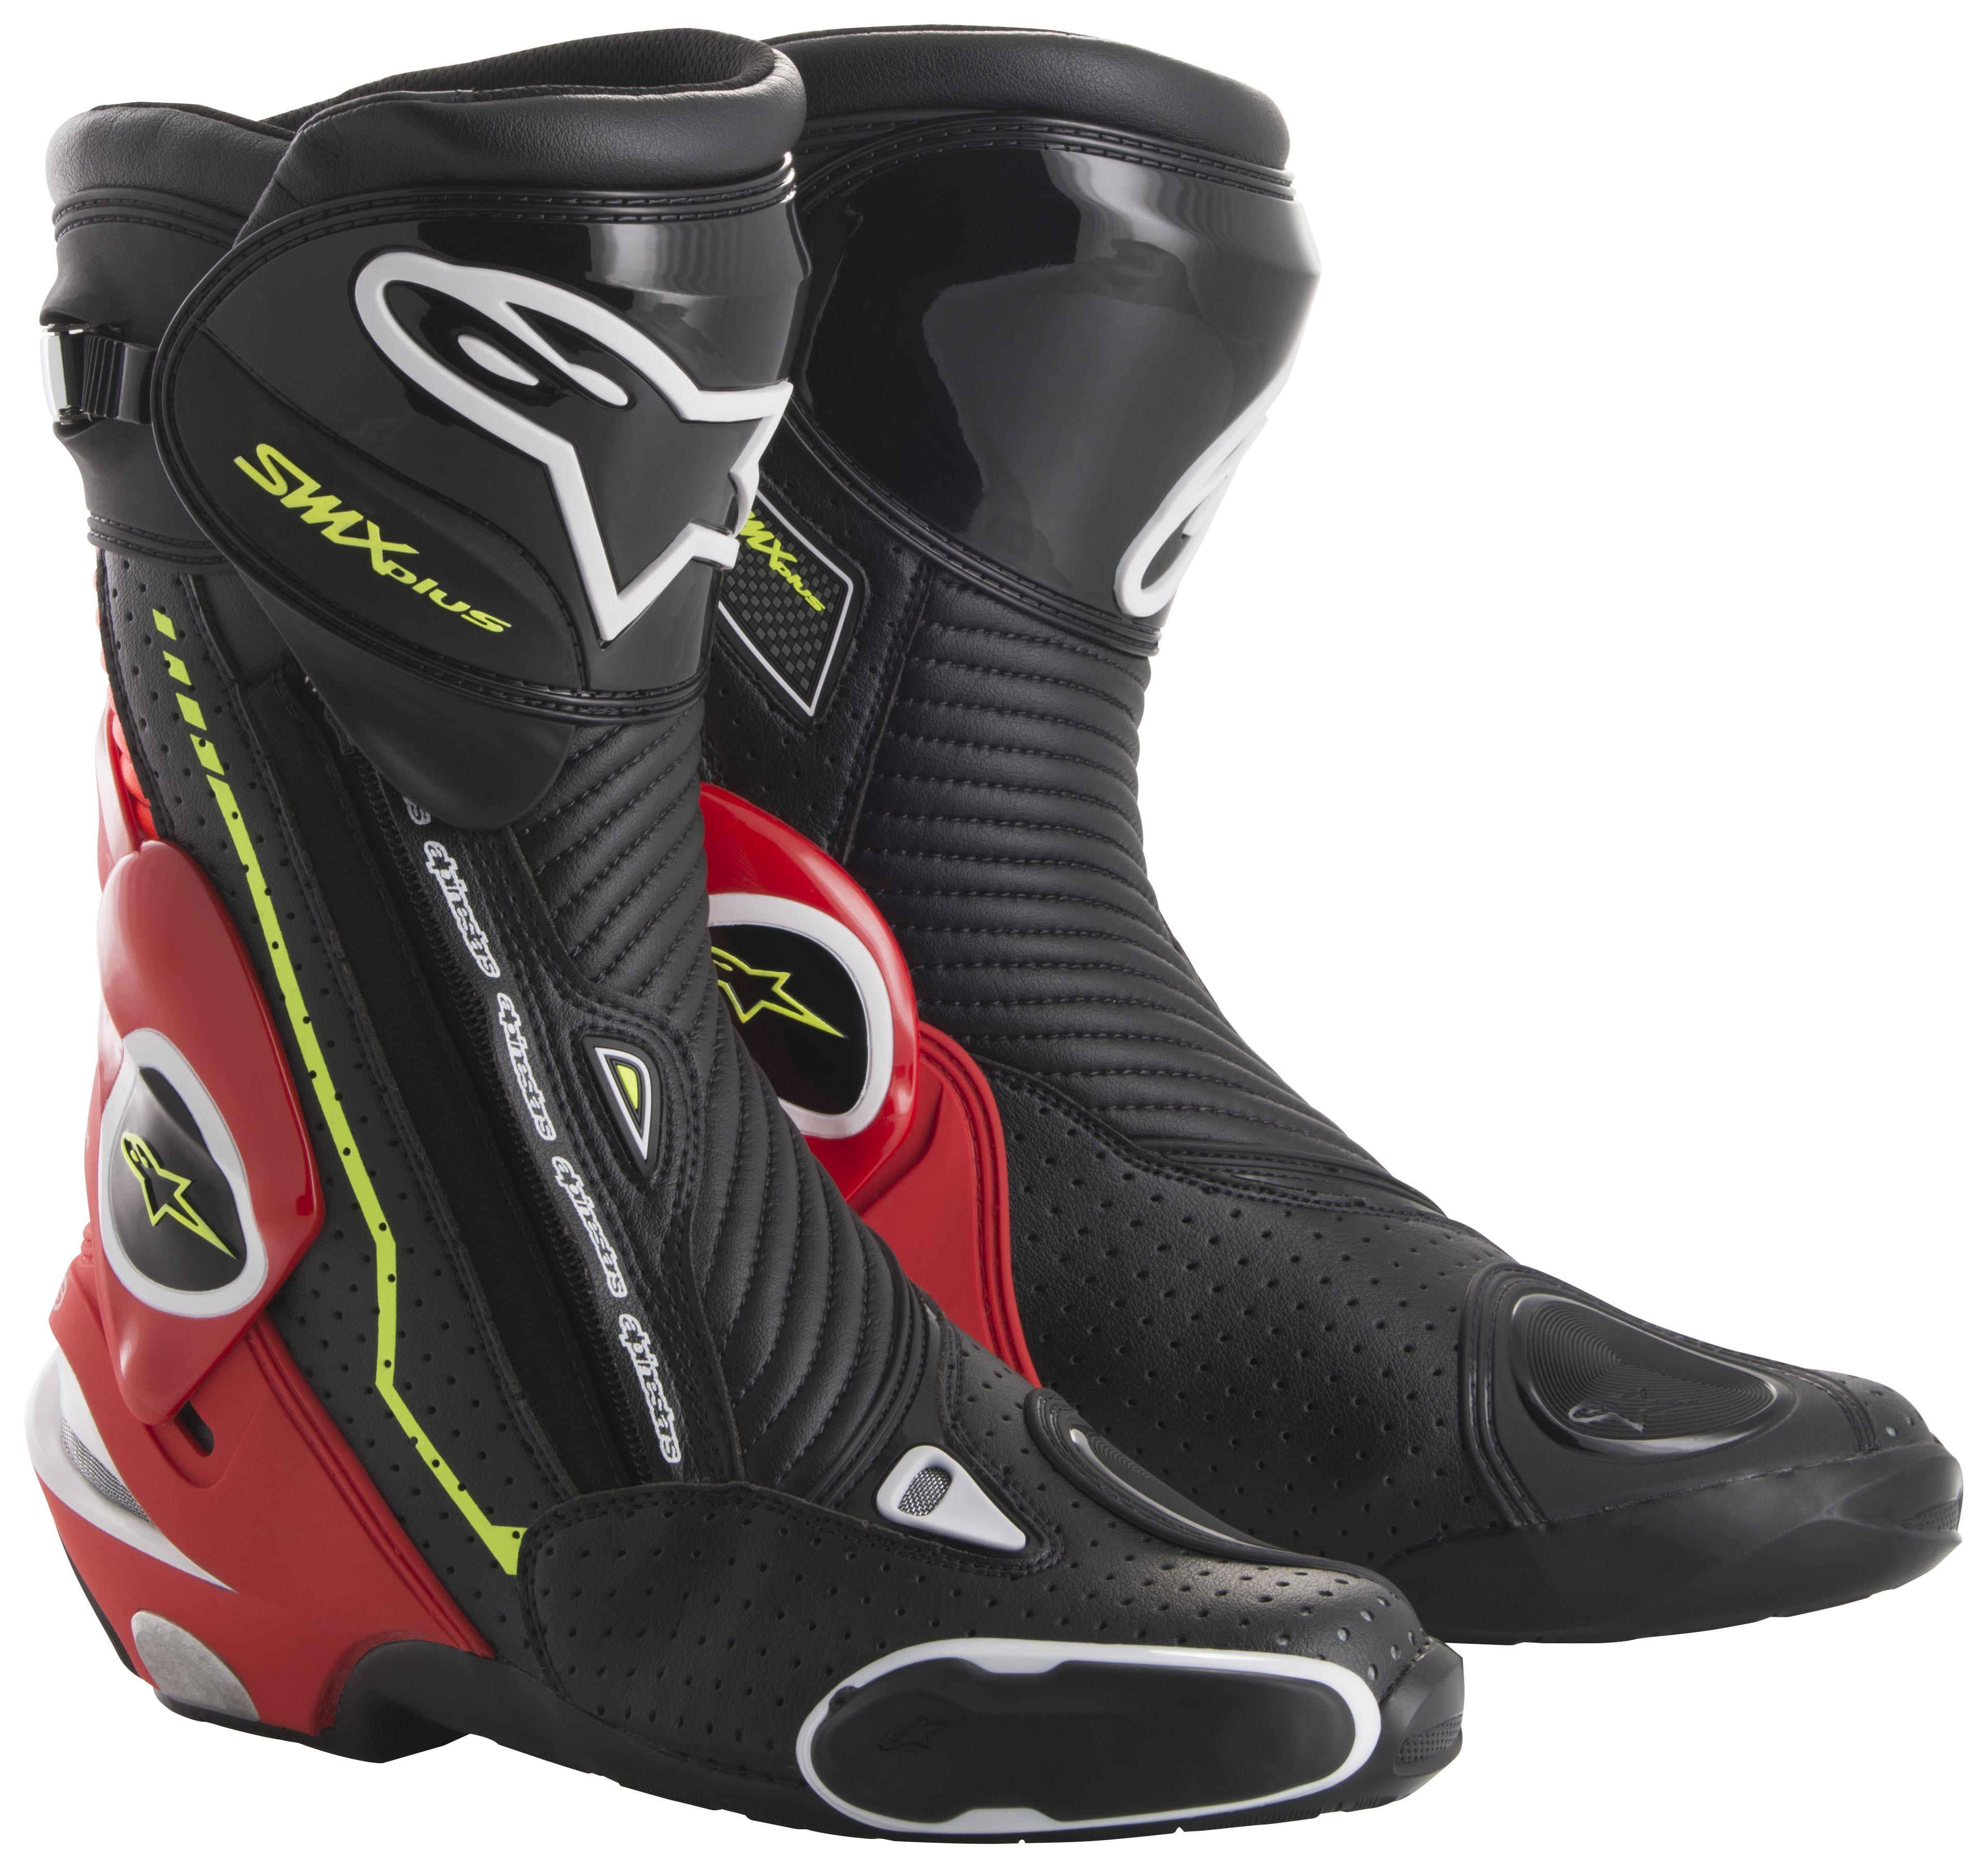 alpinestars smx plus vented boots revzilla